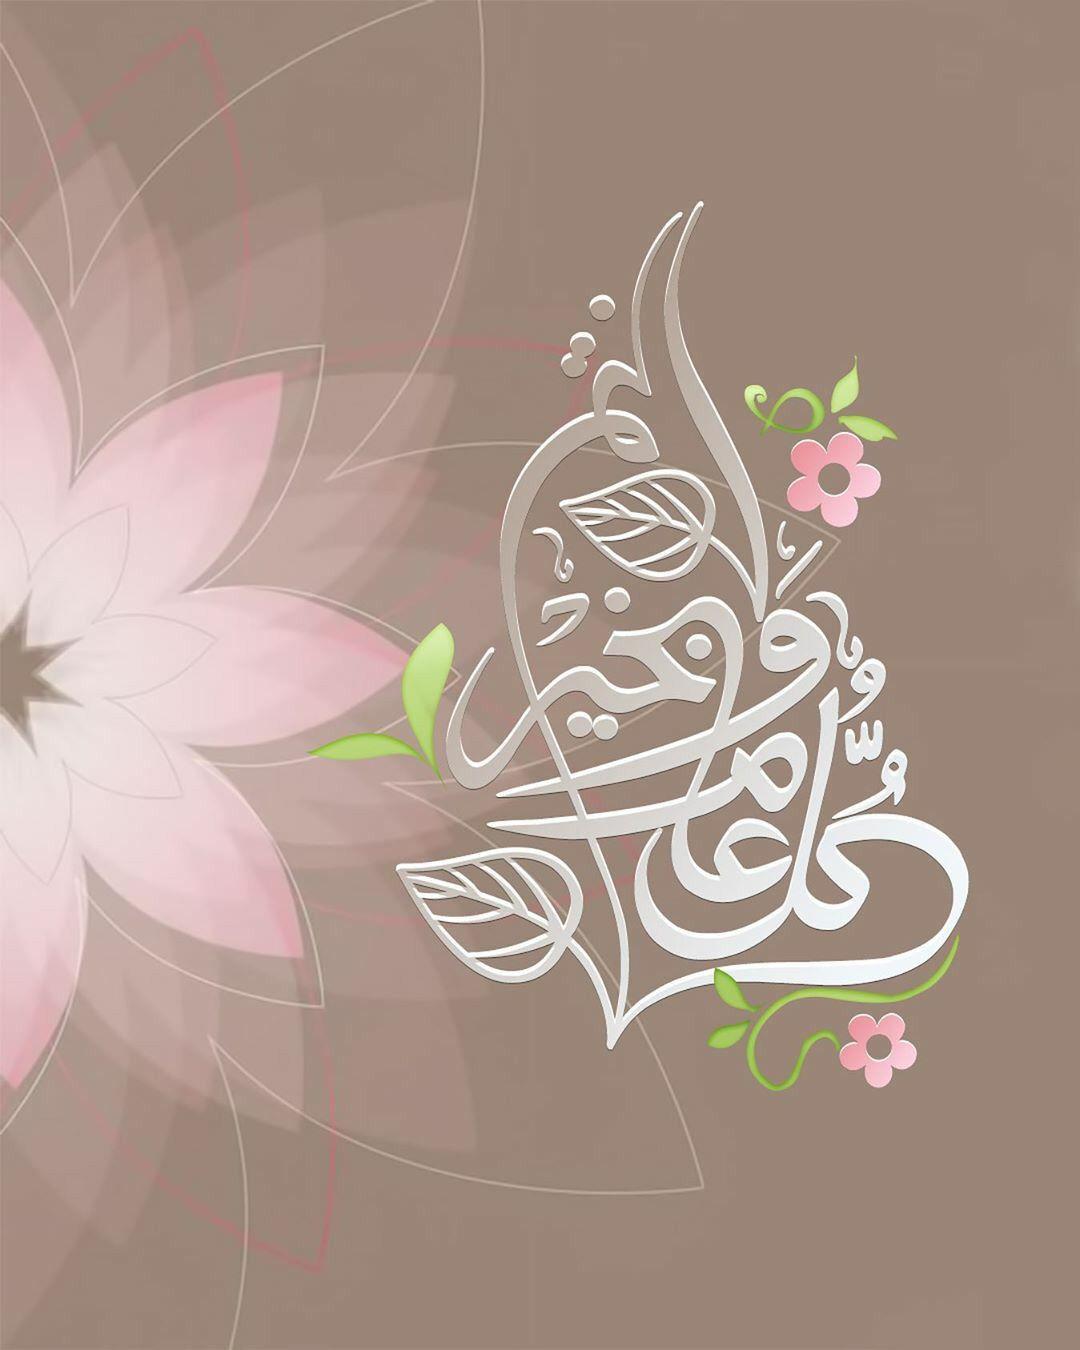 Pin By Moses Moudy On تهاني العيد الفطر المبارك لعام ١٤٤٠ Happy Eid Eid Cards Islamic Images